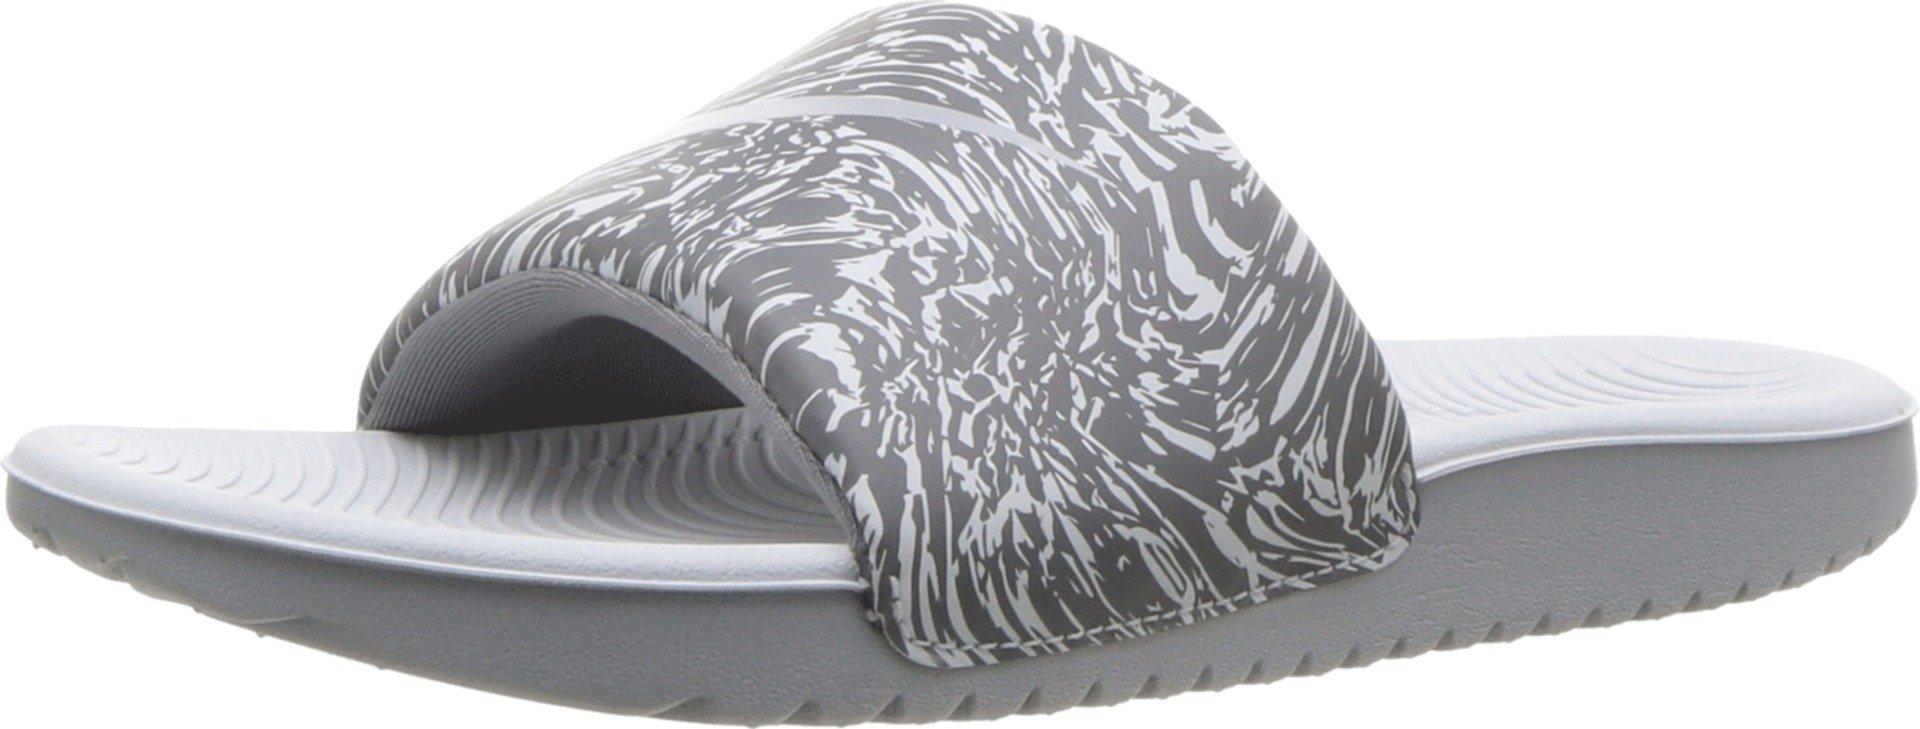 Nike Kawa Slide Print (gs/ps) Big Kids 819358-006 Size 5